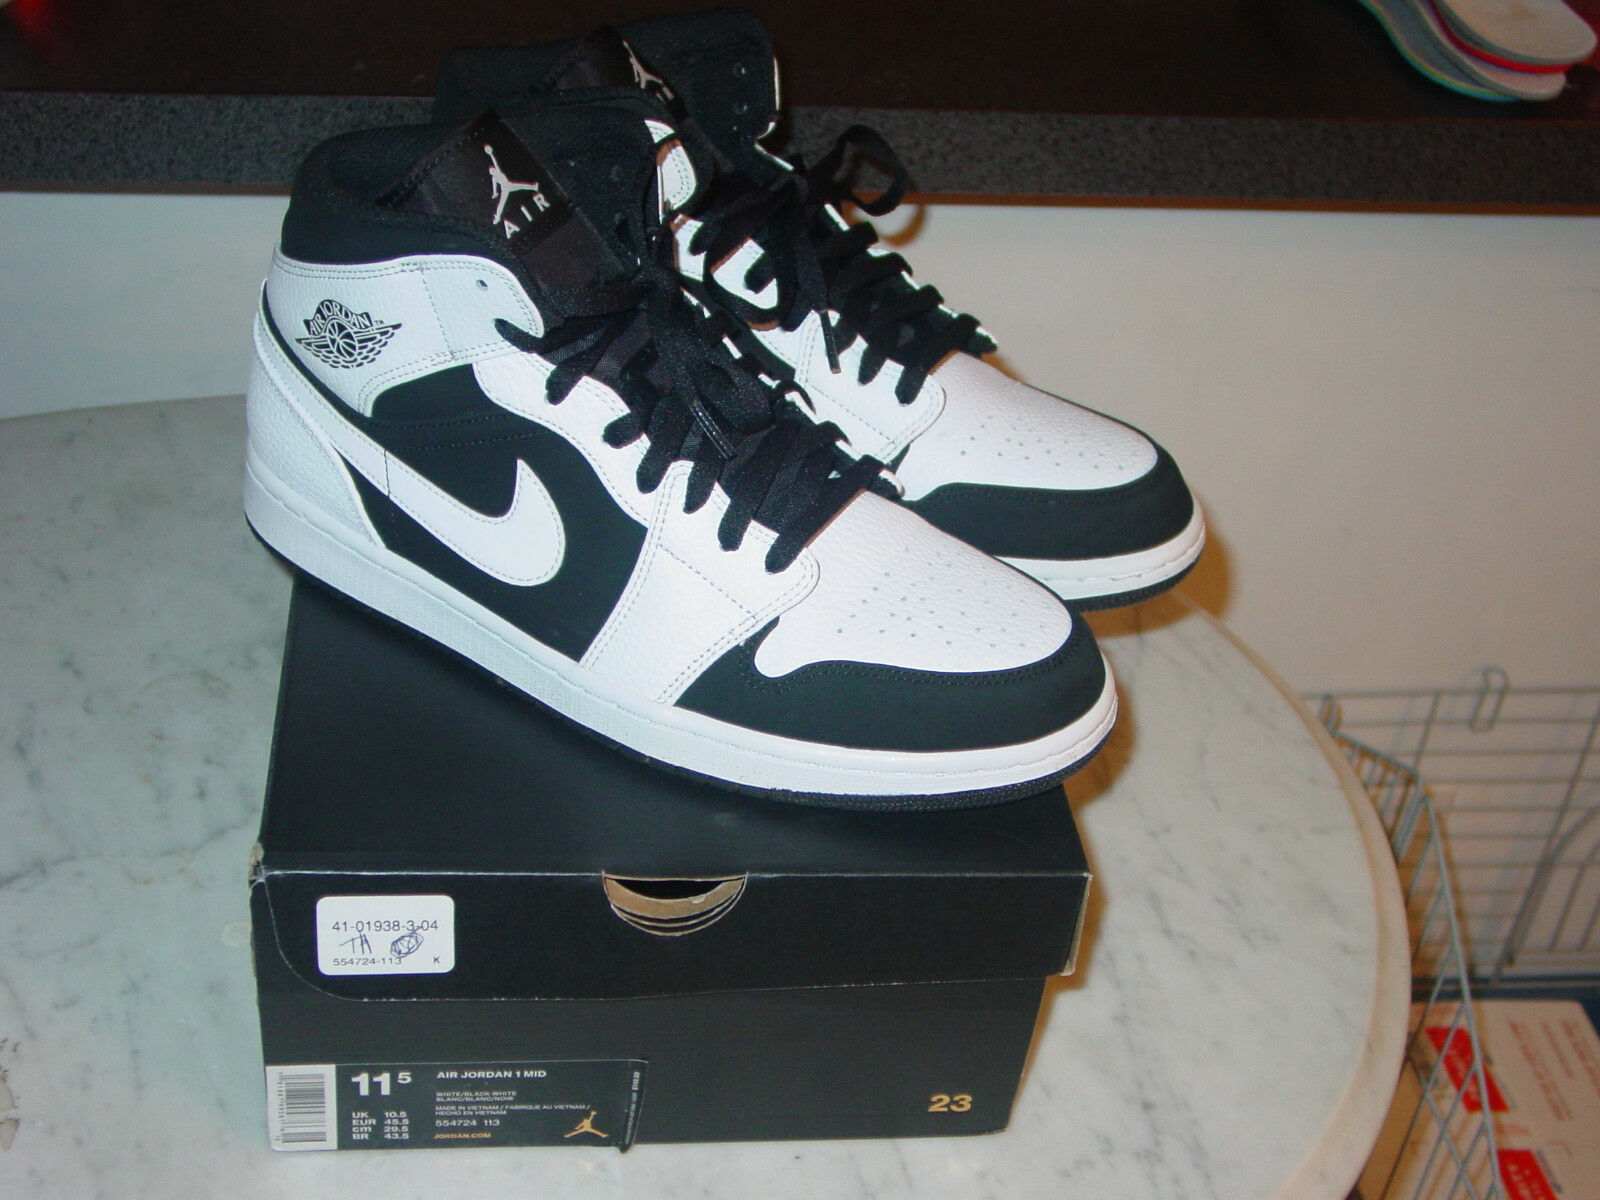 4b13432b5eb8aa 2018 Nike Air Jordan Retro 1 Tuxedo Black White Mid shoes Size 11 w Box